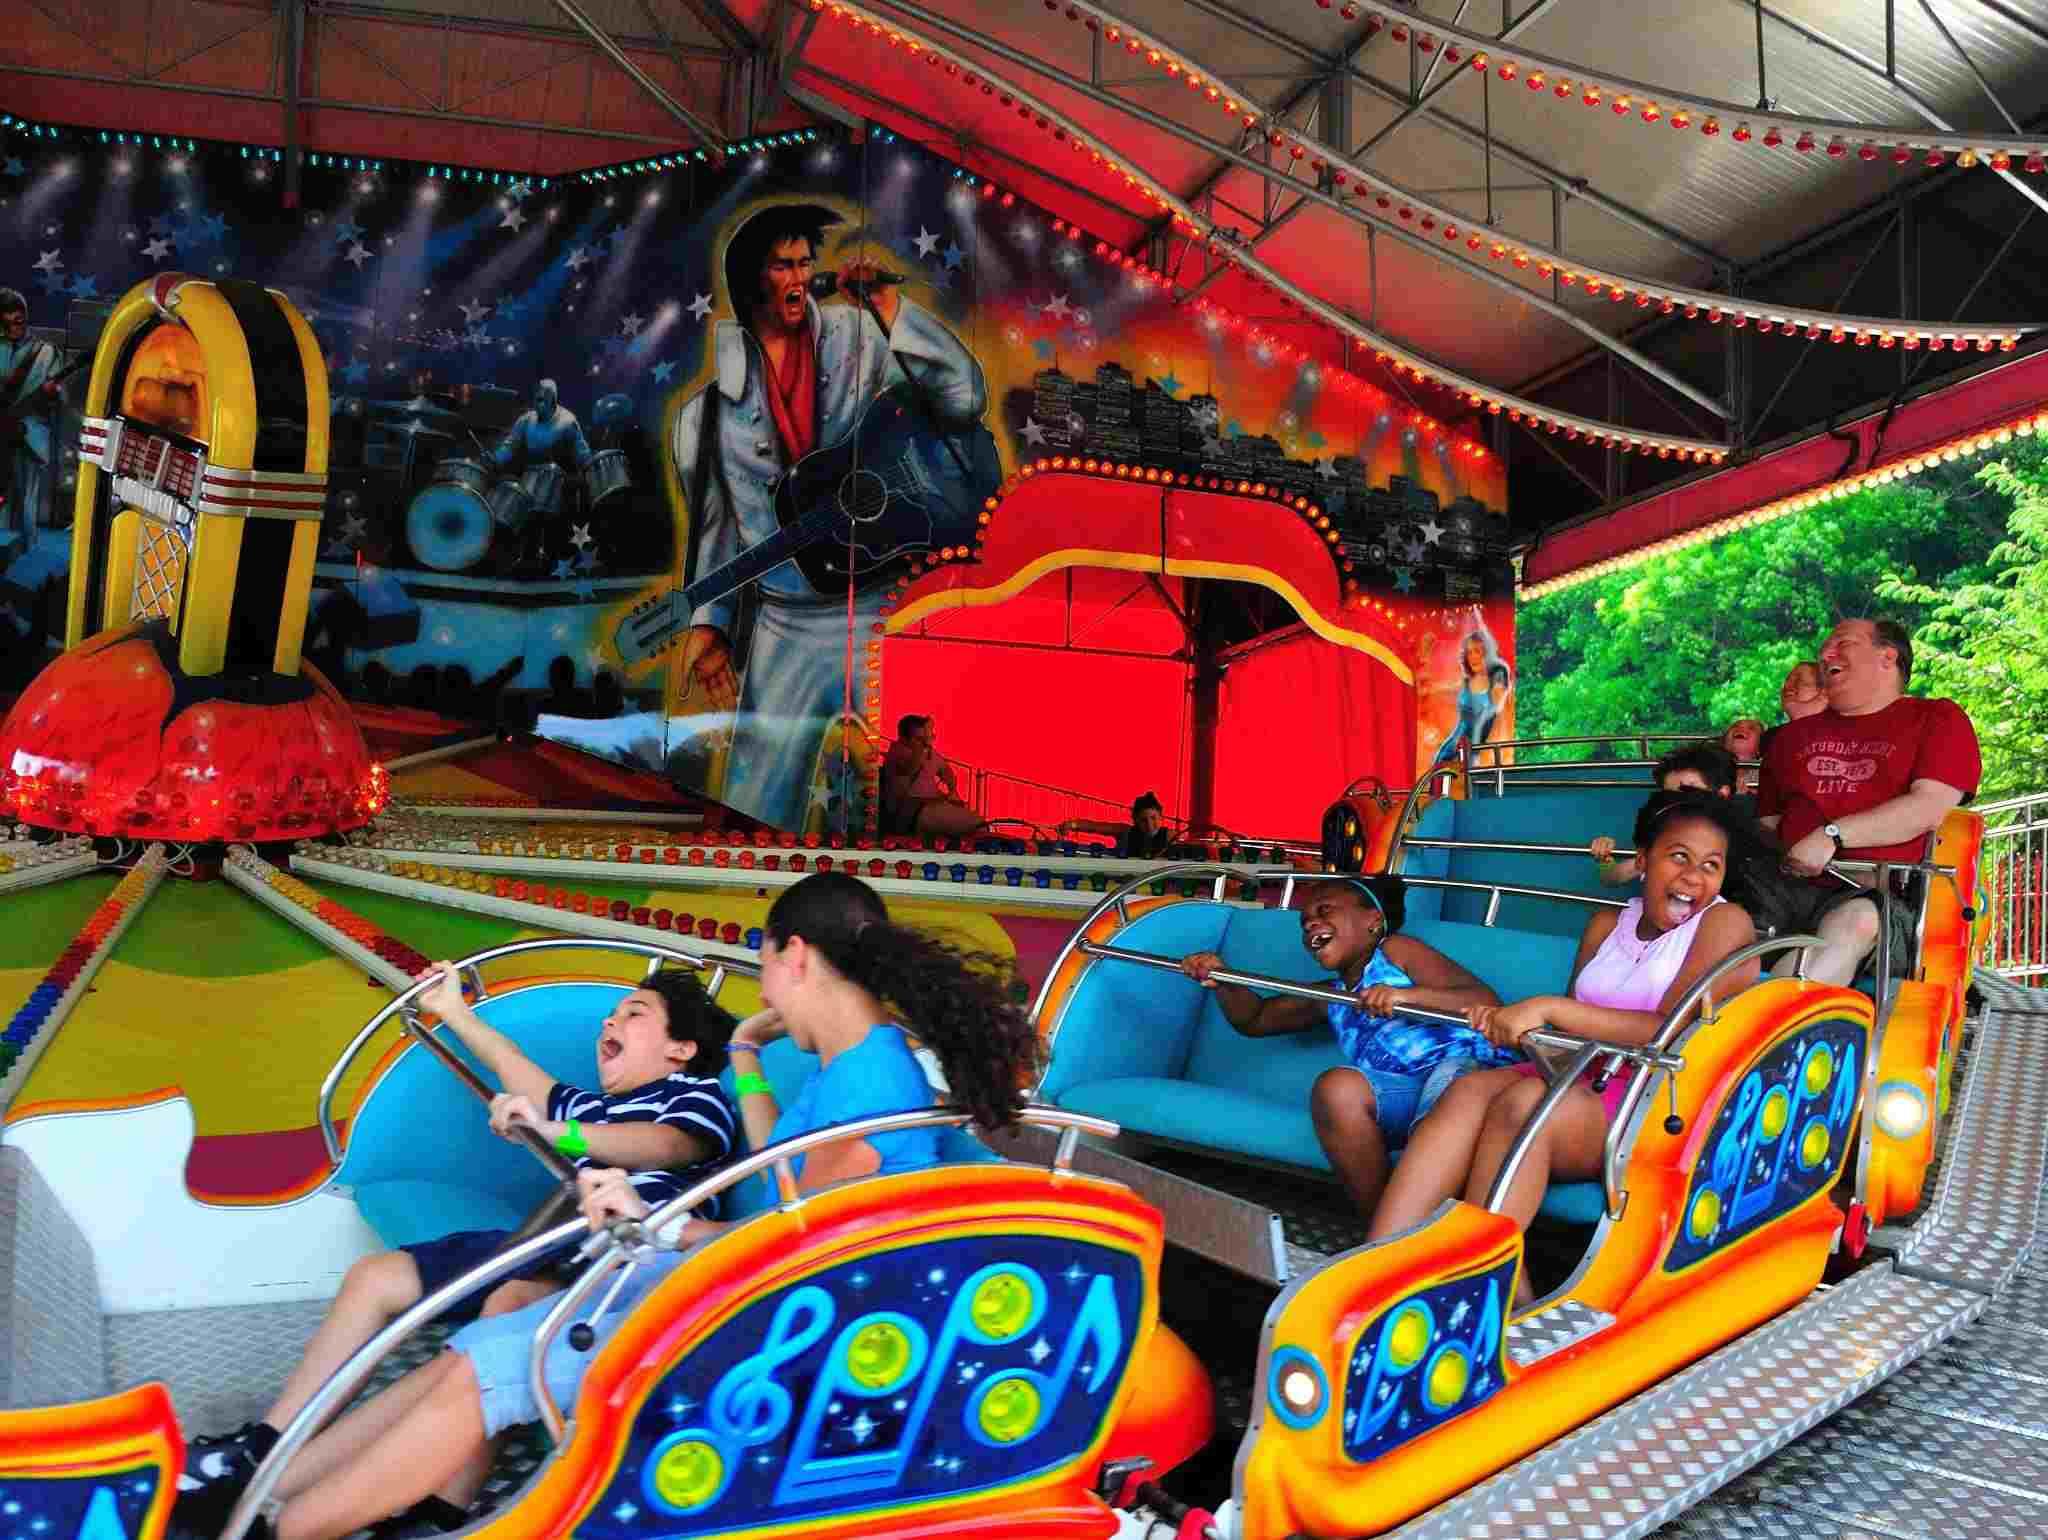 Bowcraft Amusement Park New Jersey